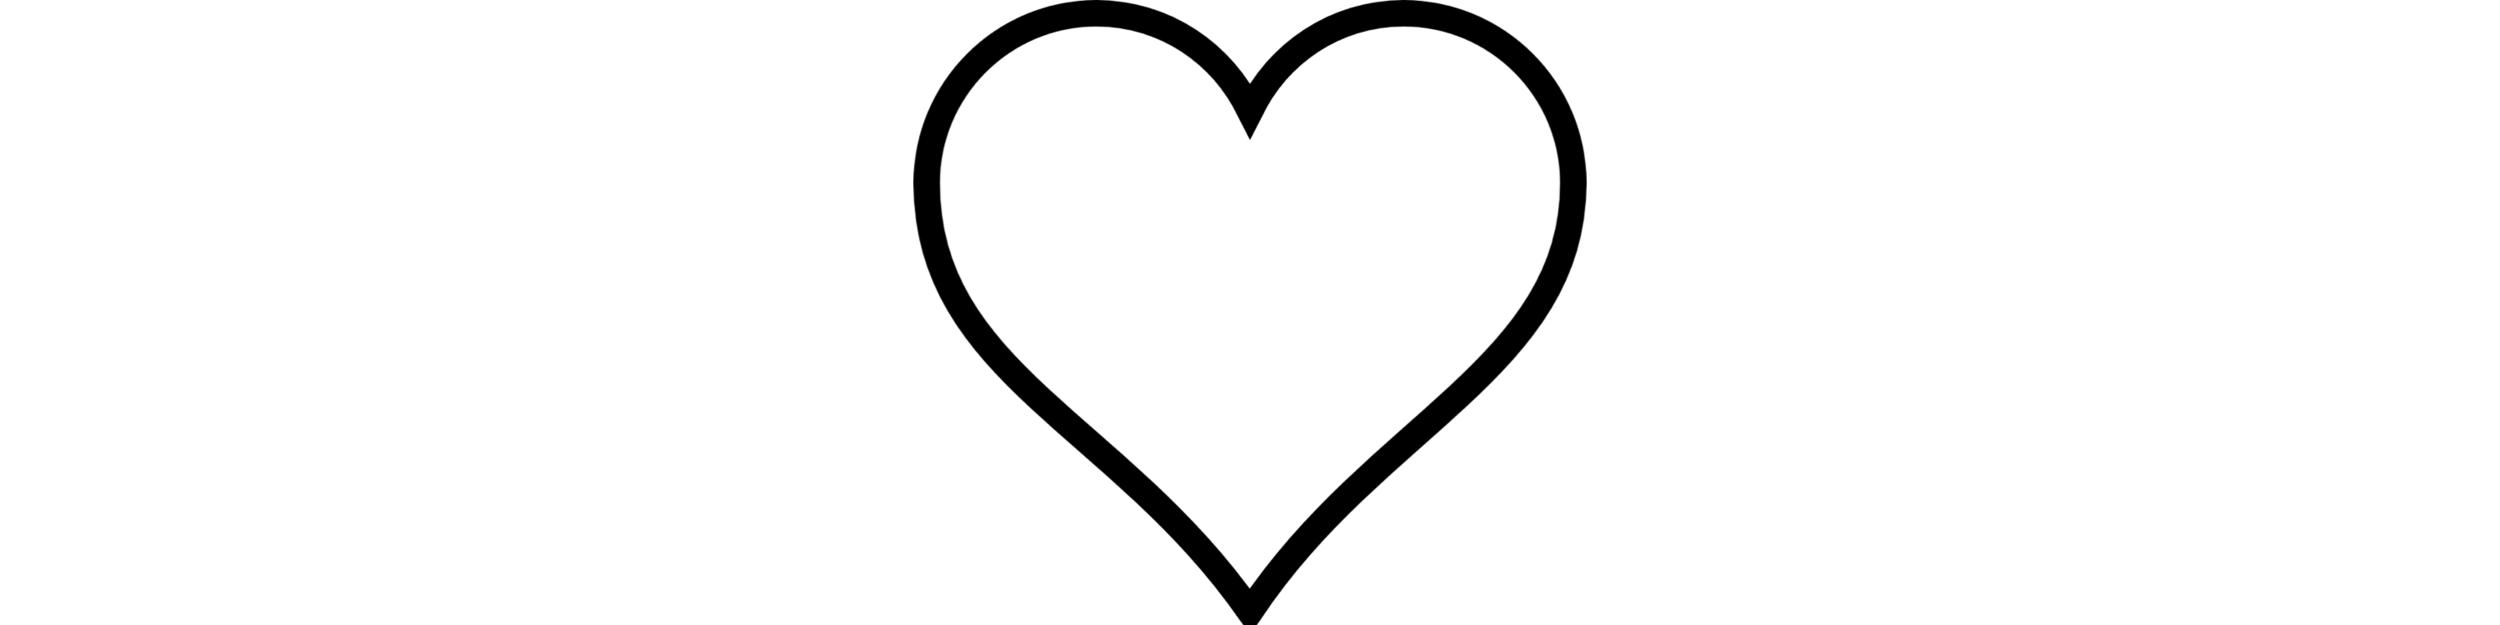 Heart_Serve.png